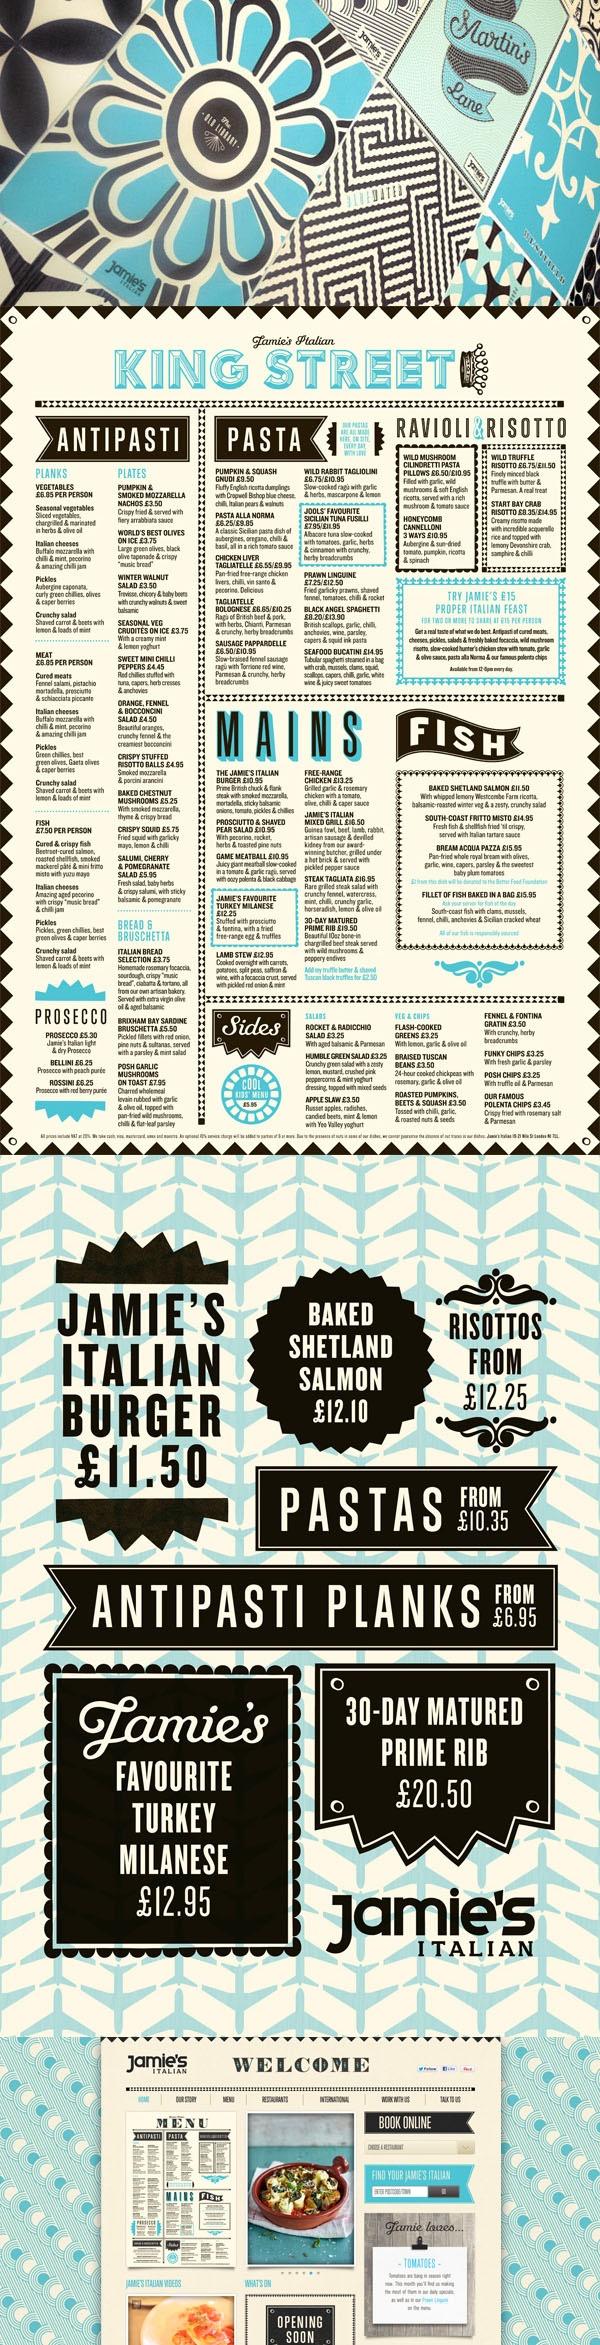 Jamie's Italian   Superfantastic   jamie oliver restaurant ★★★★★